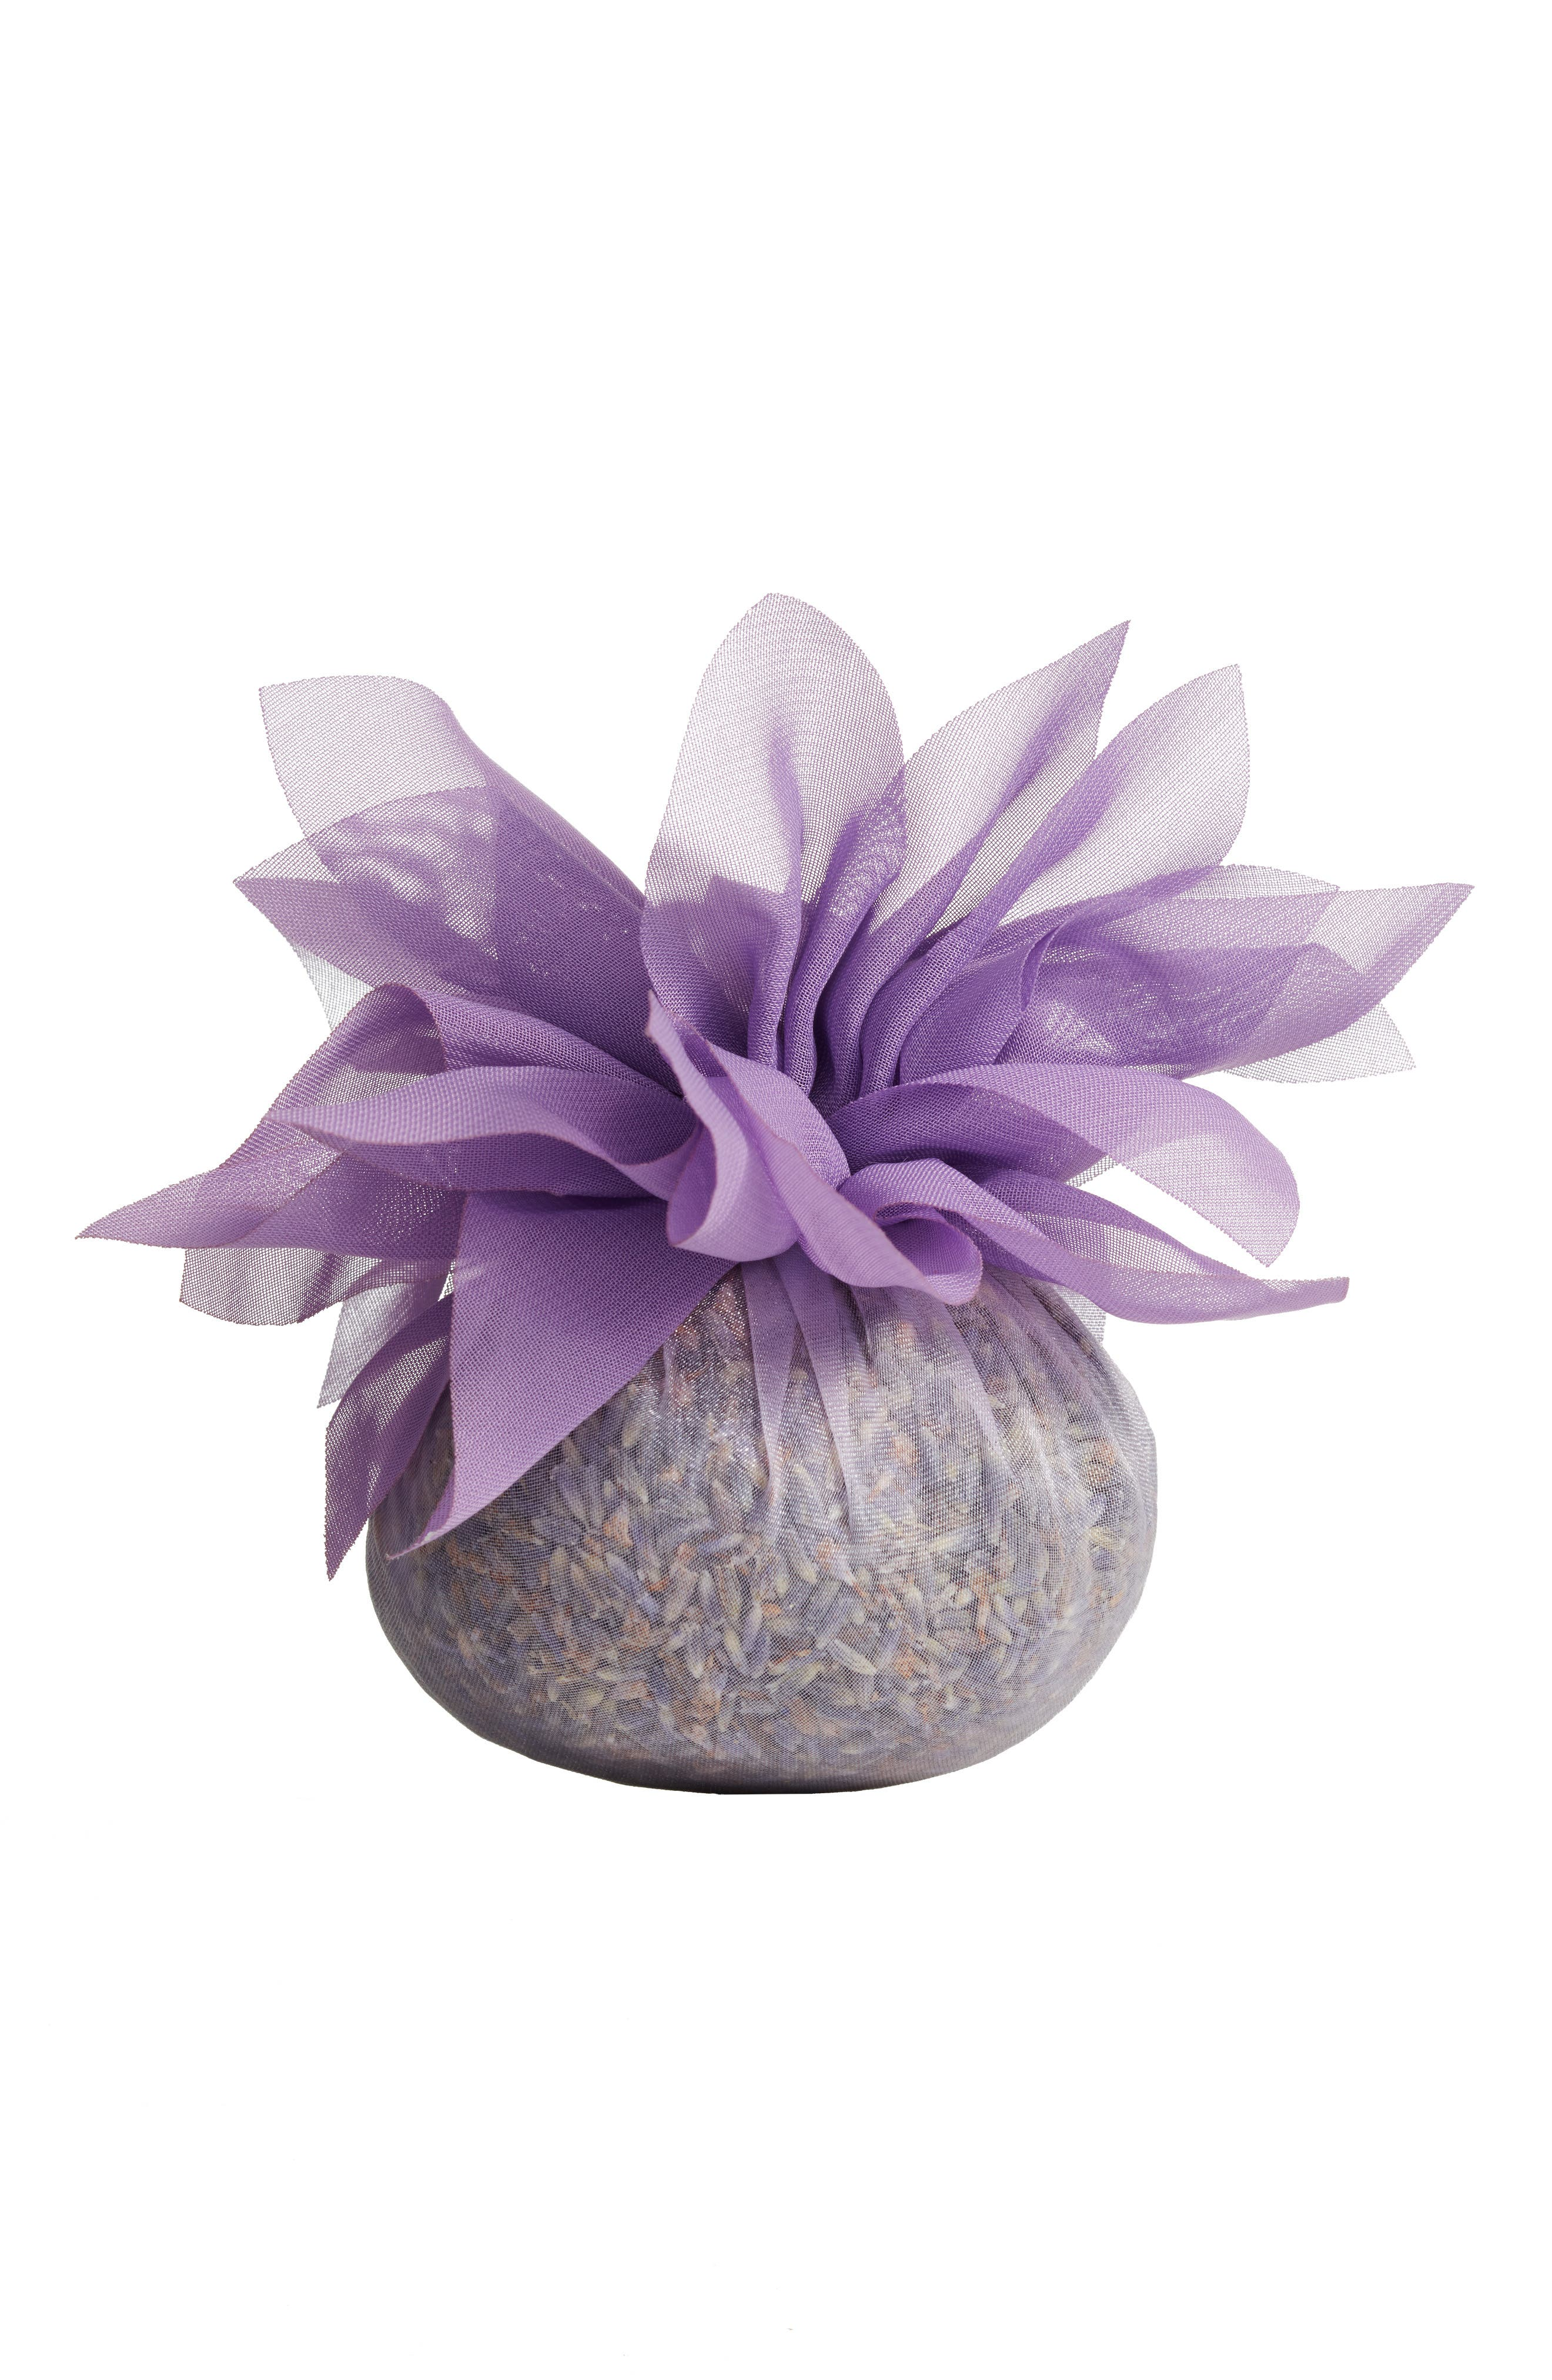 Sonoma Lavender Purple Flower Sachet